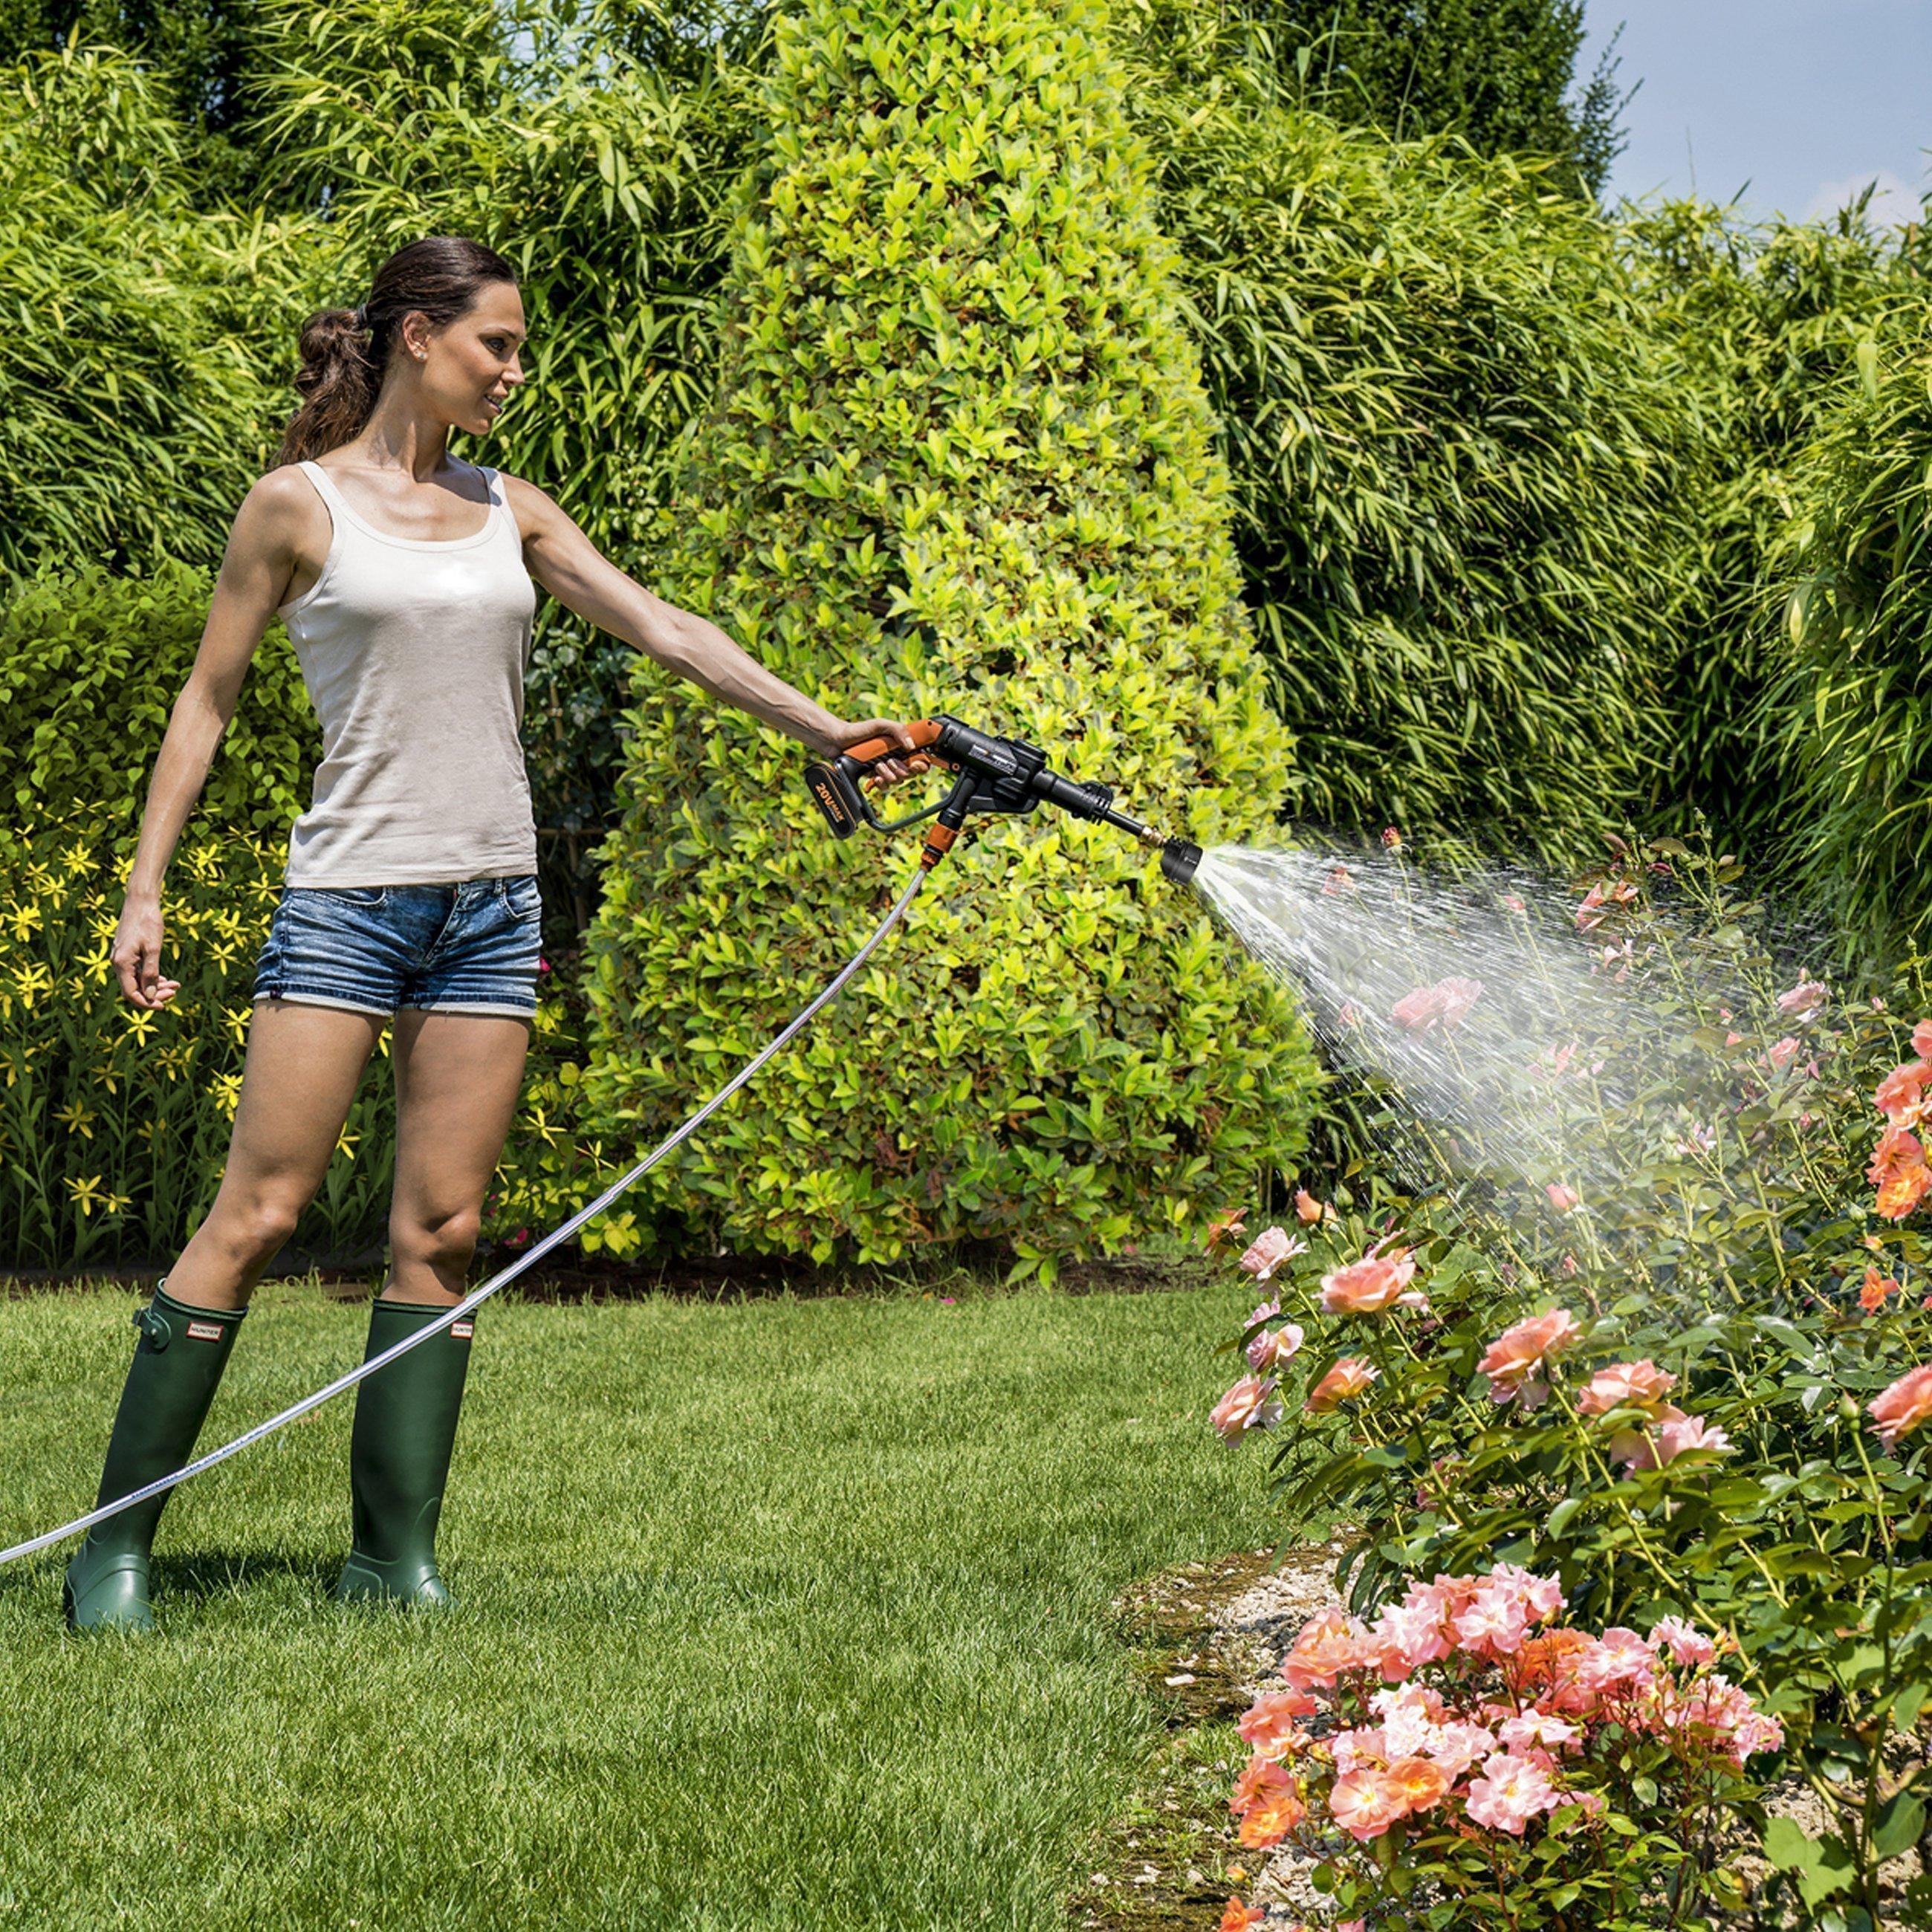 Worx WG629E Worx 20V Akku-Hochdruckreiniger, Frau bewässert Blumen